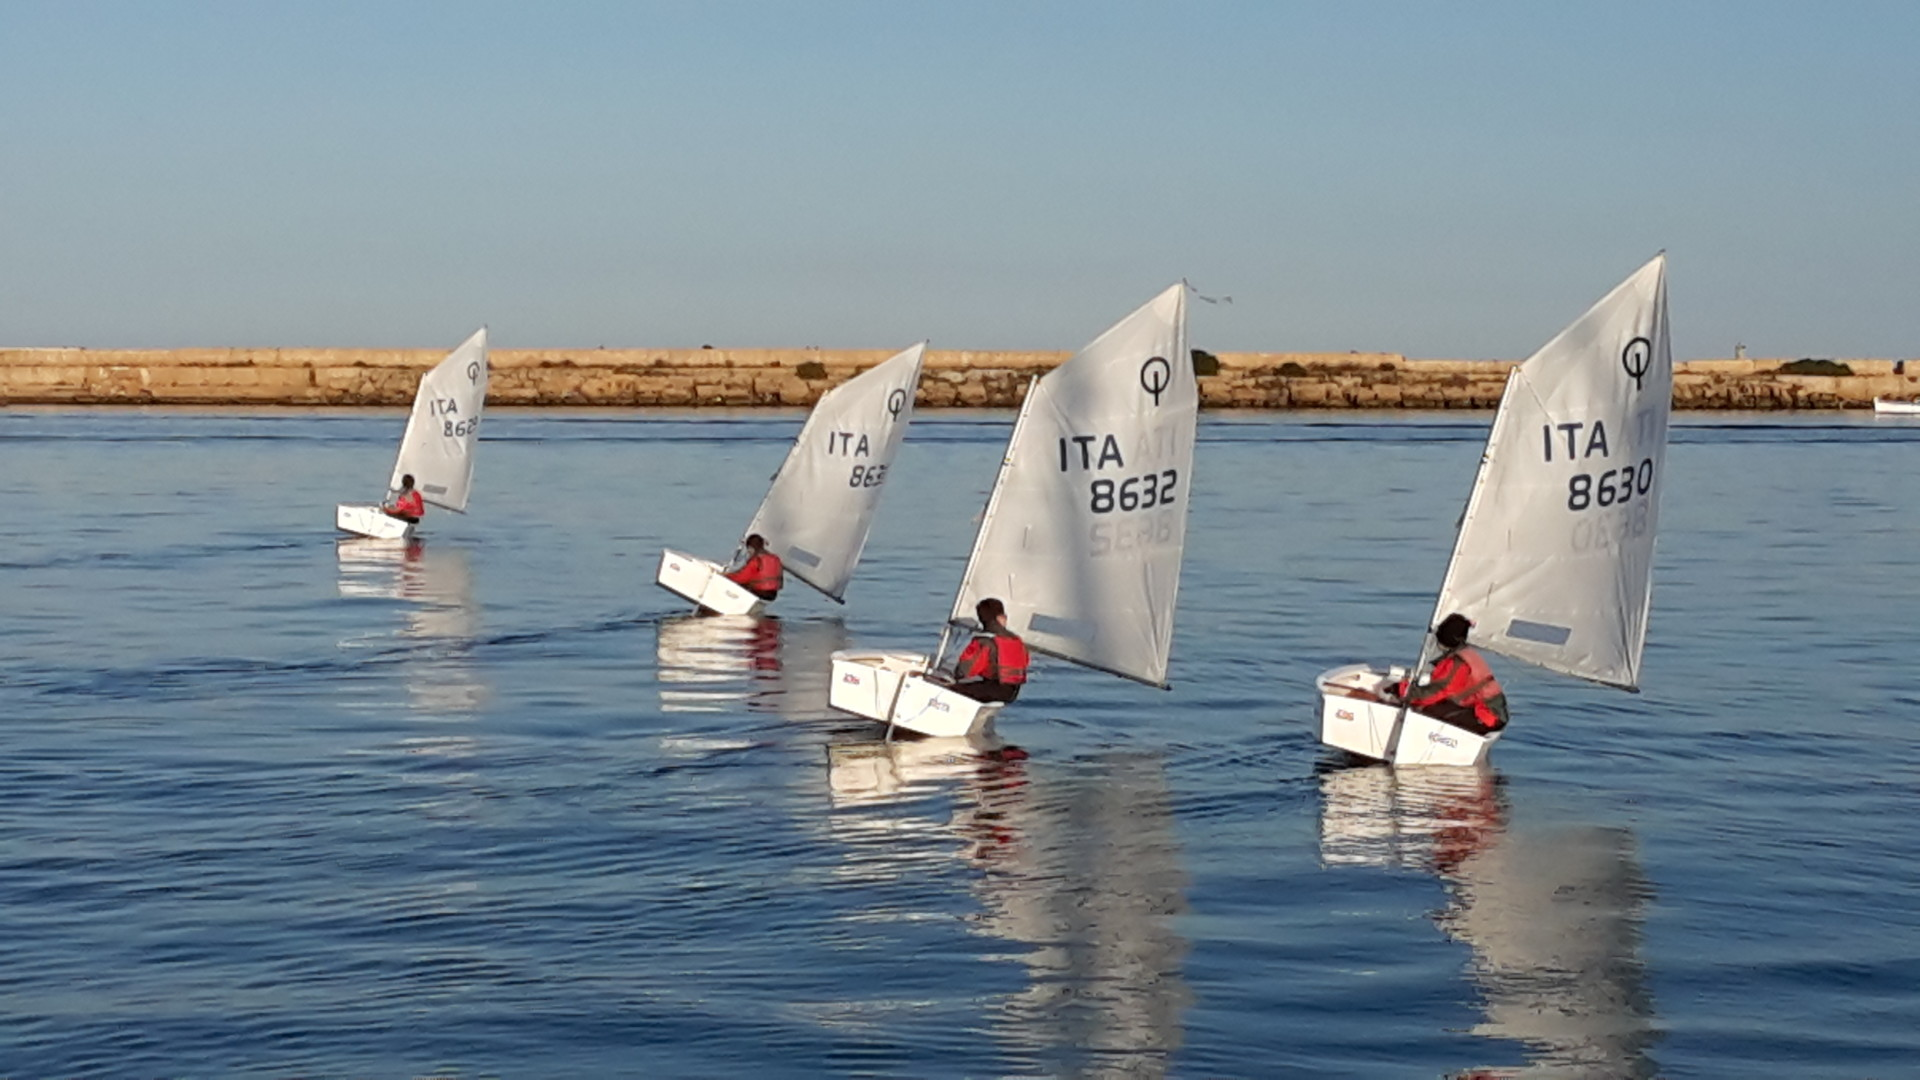 Scuola-di-vela-lega-navale-LNI-Brindisi (8)